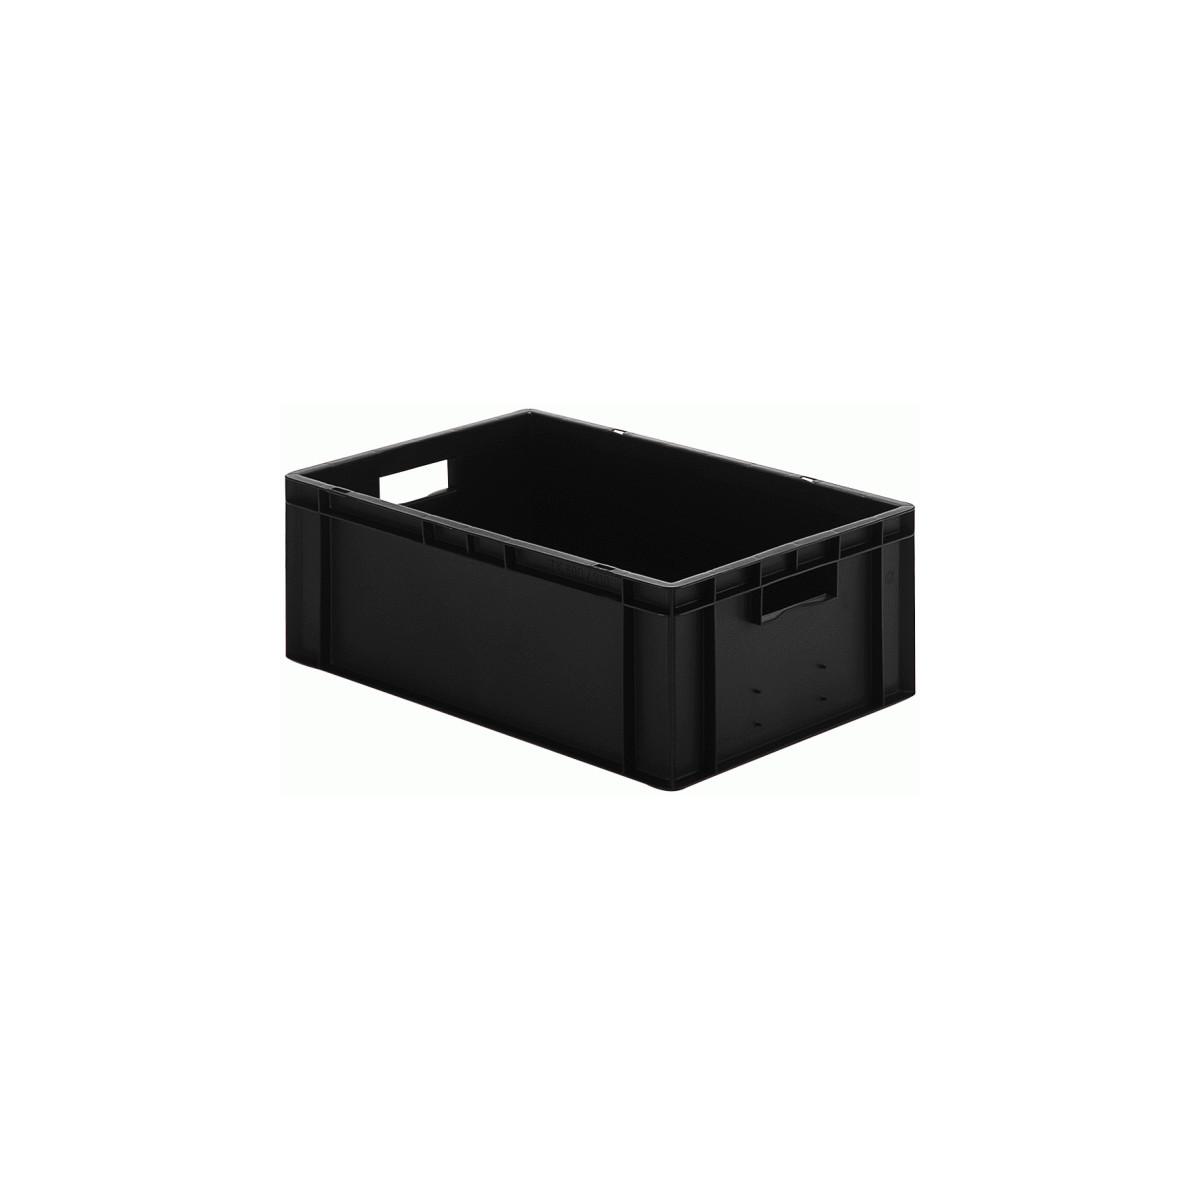 esd transport stapelbox tkl 600 210 0 600x400x210 mm. Black Bedroom Furniture Sets. Home Design Ideas